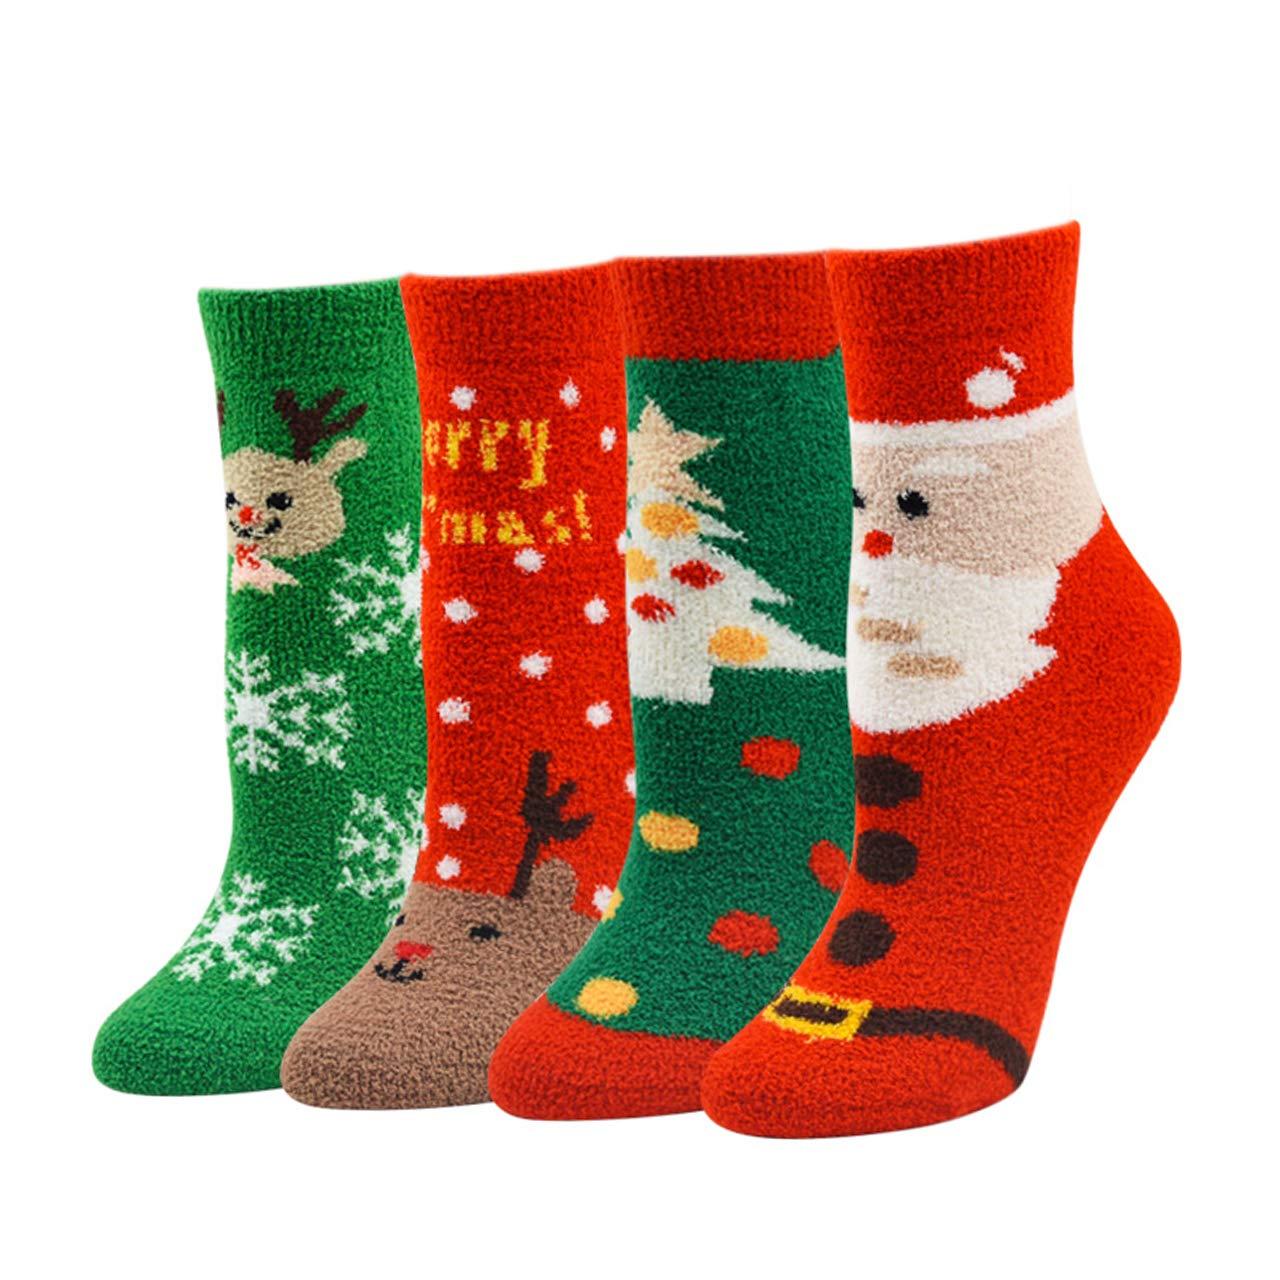 FALETO 4-10 pairs Women Christmas Holiday Fuzzy Fluffy Socks Super Soft Cozy Warm Winter Socks